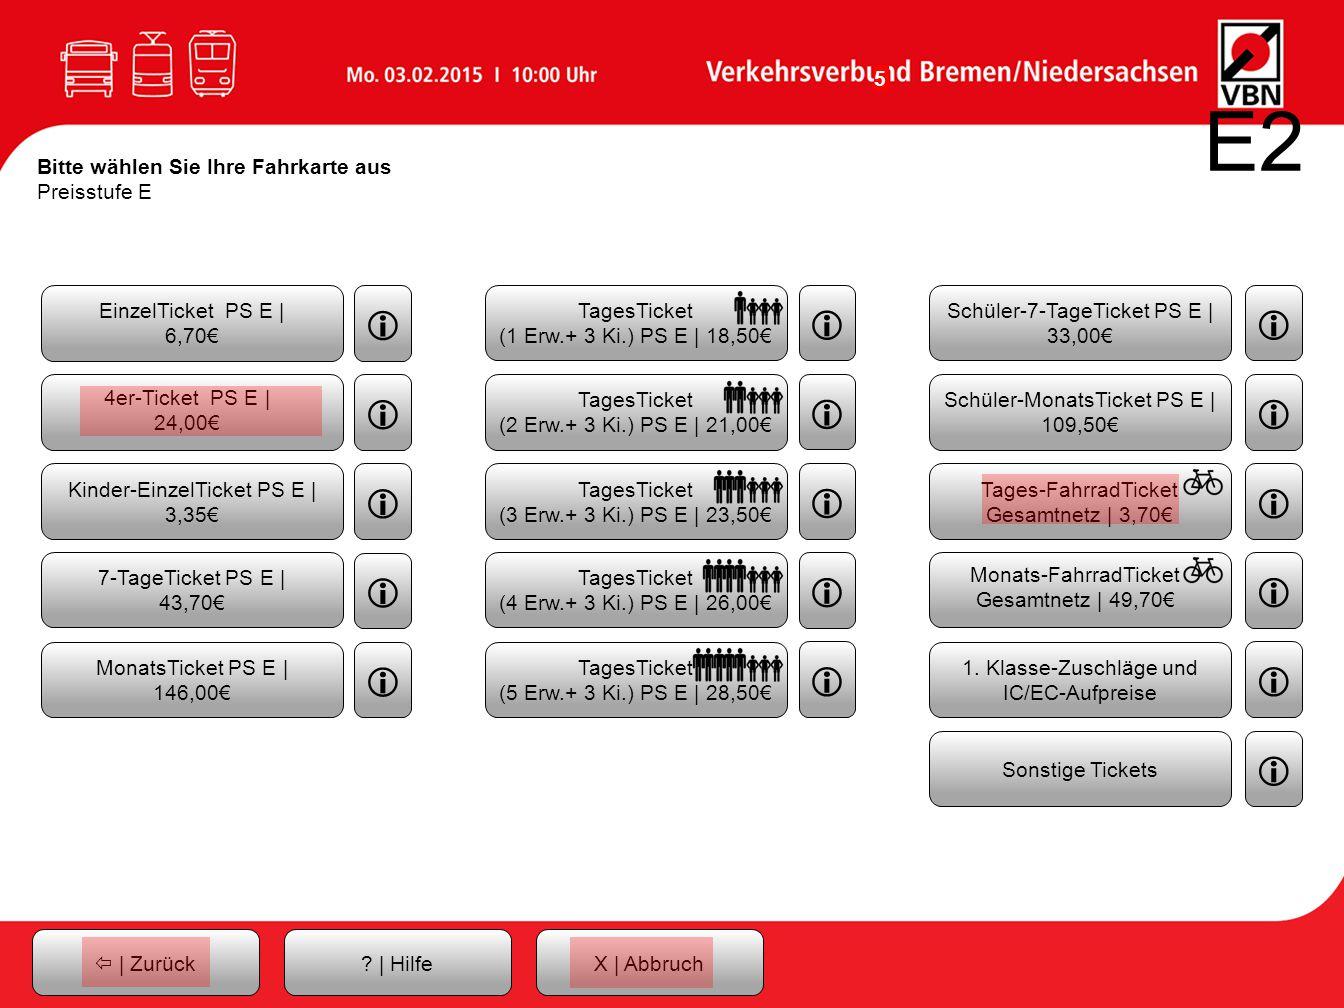 5 4er-Ticket PS E | 24,00€ E2  | ZurückX | Abbruch.